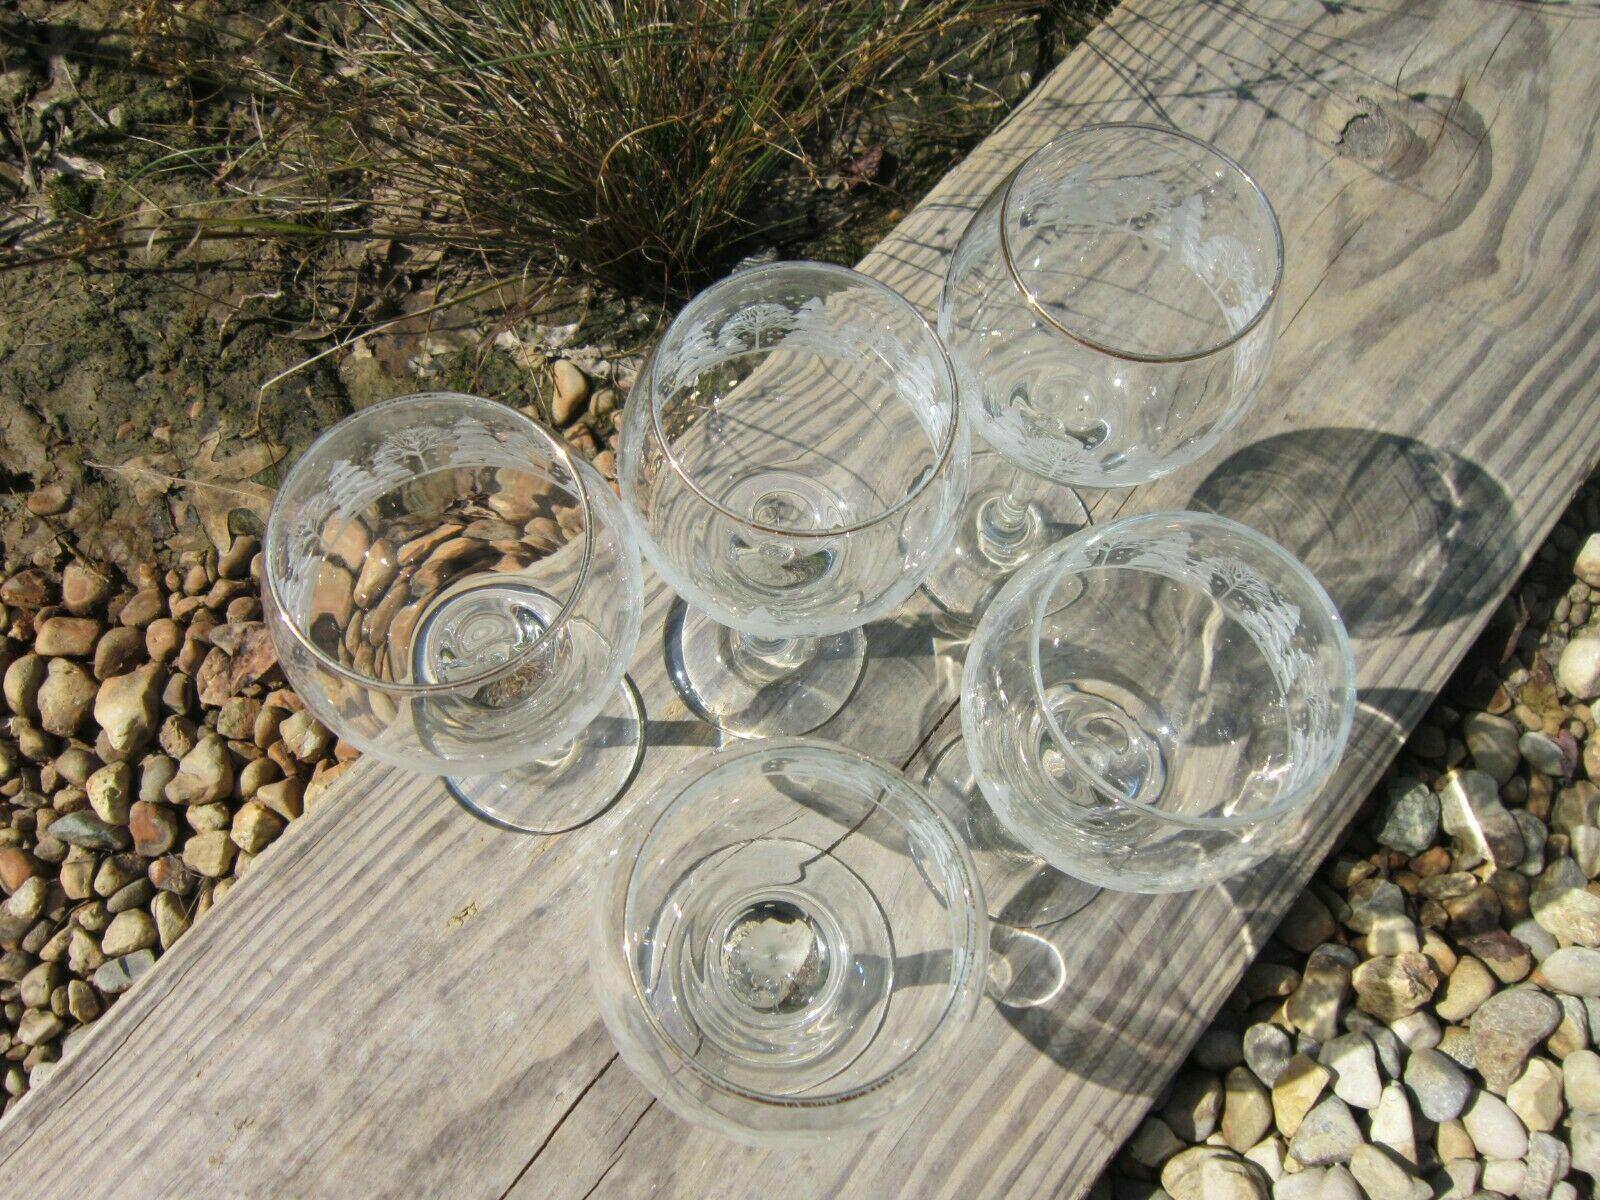 Arby's Winter Goblets, Set of 5 Vintage 1980s Wine Glasses image 6